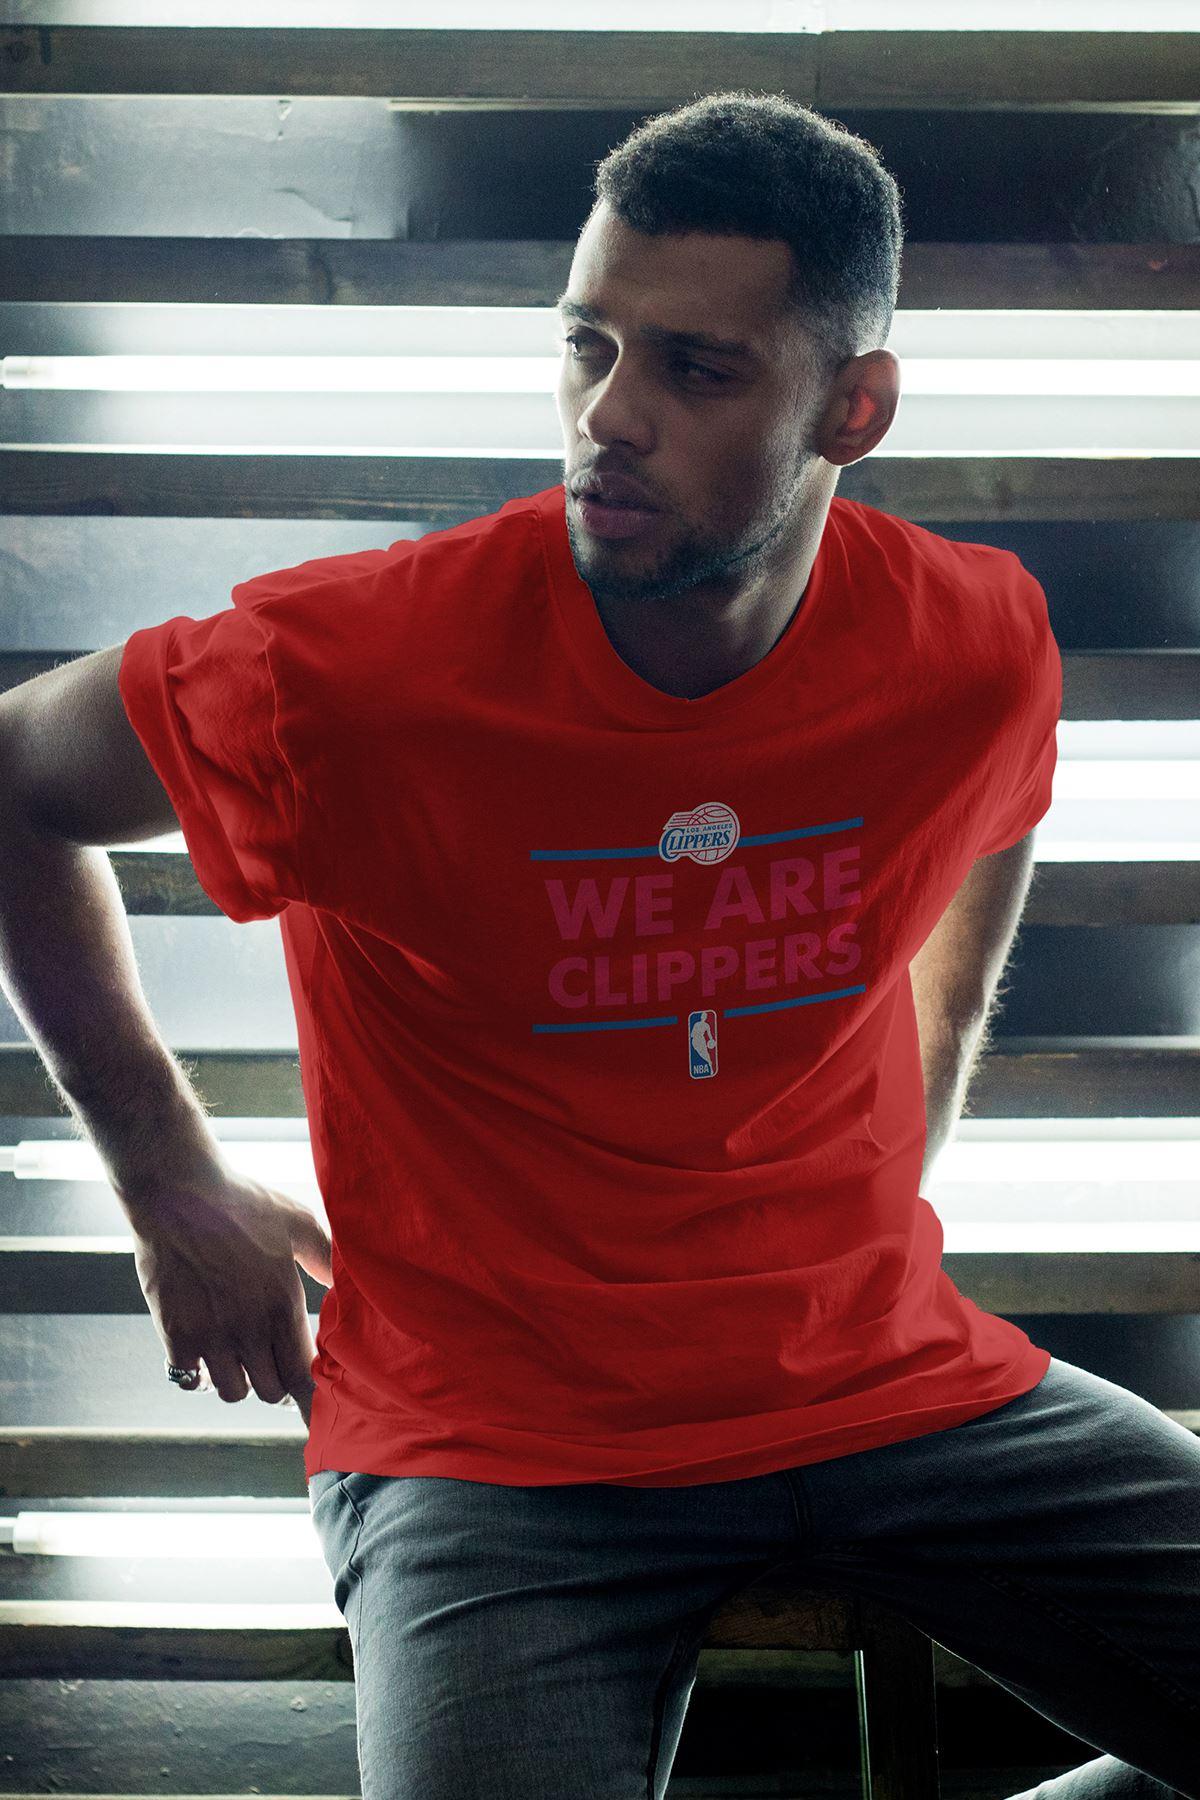 Clippers 164 Kırmızı Erkek Oversize Tshirt - Tişört